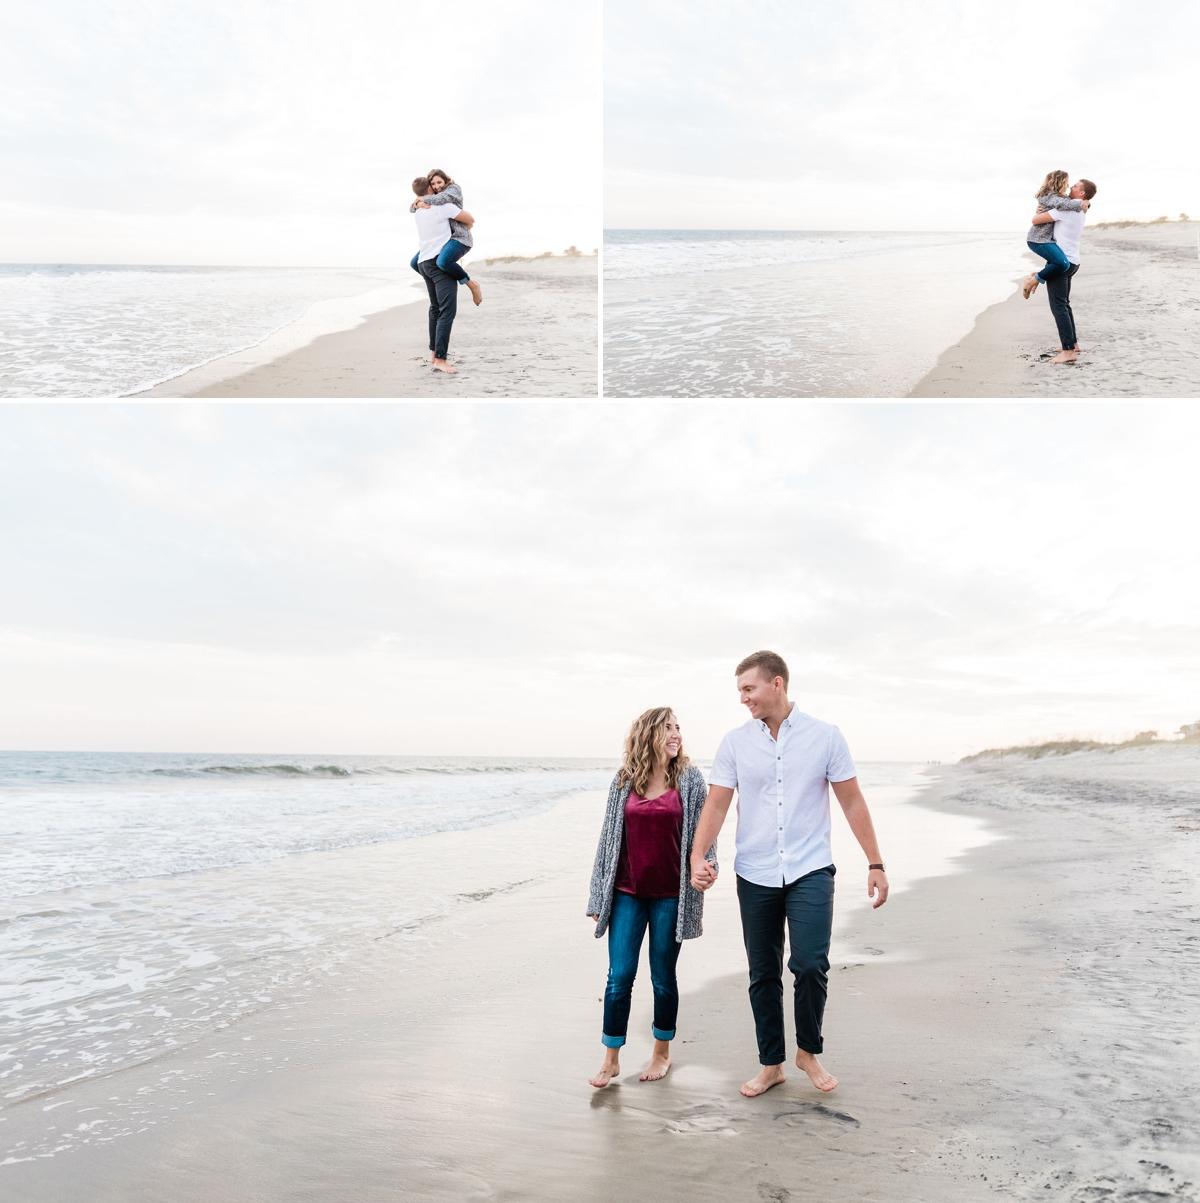 Sunset Beach Engagement Session at Tybee Island - Savannah Engagement Photographer